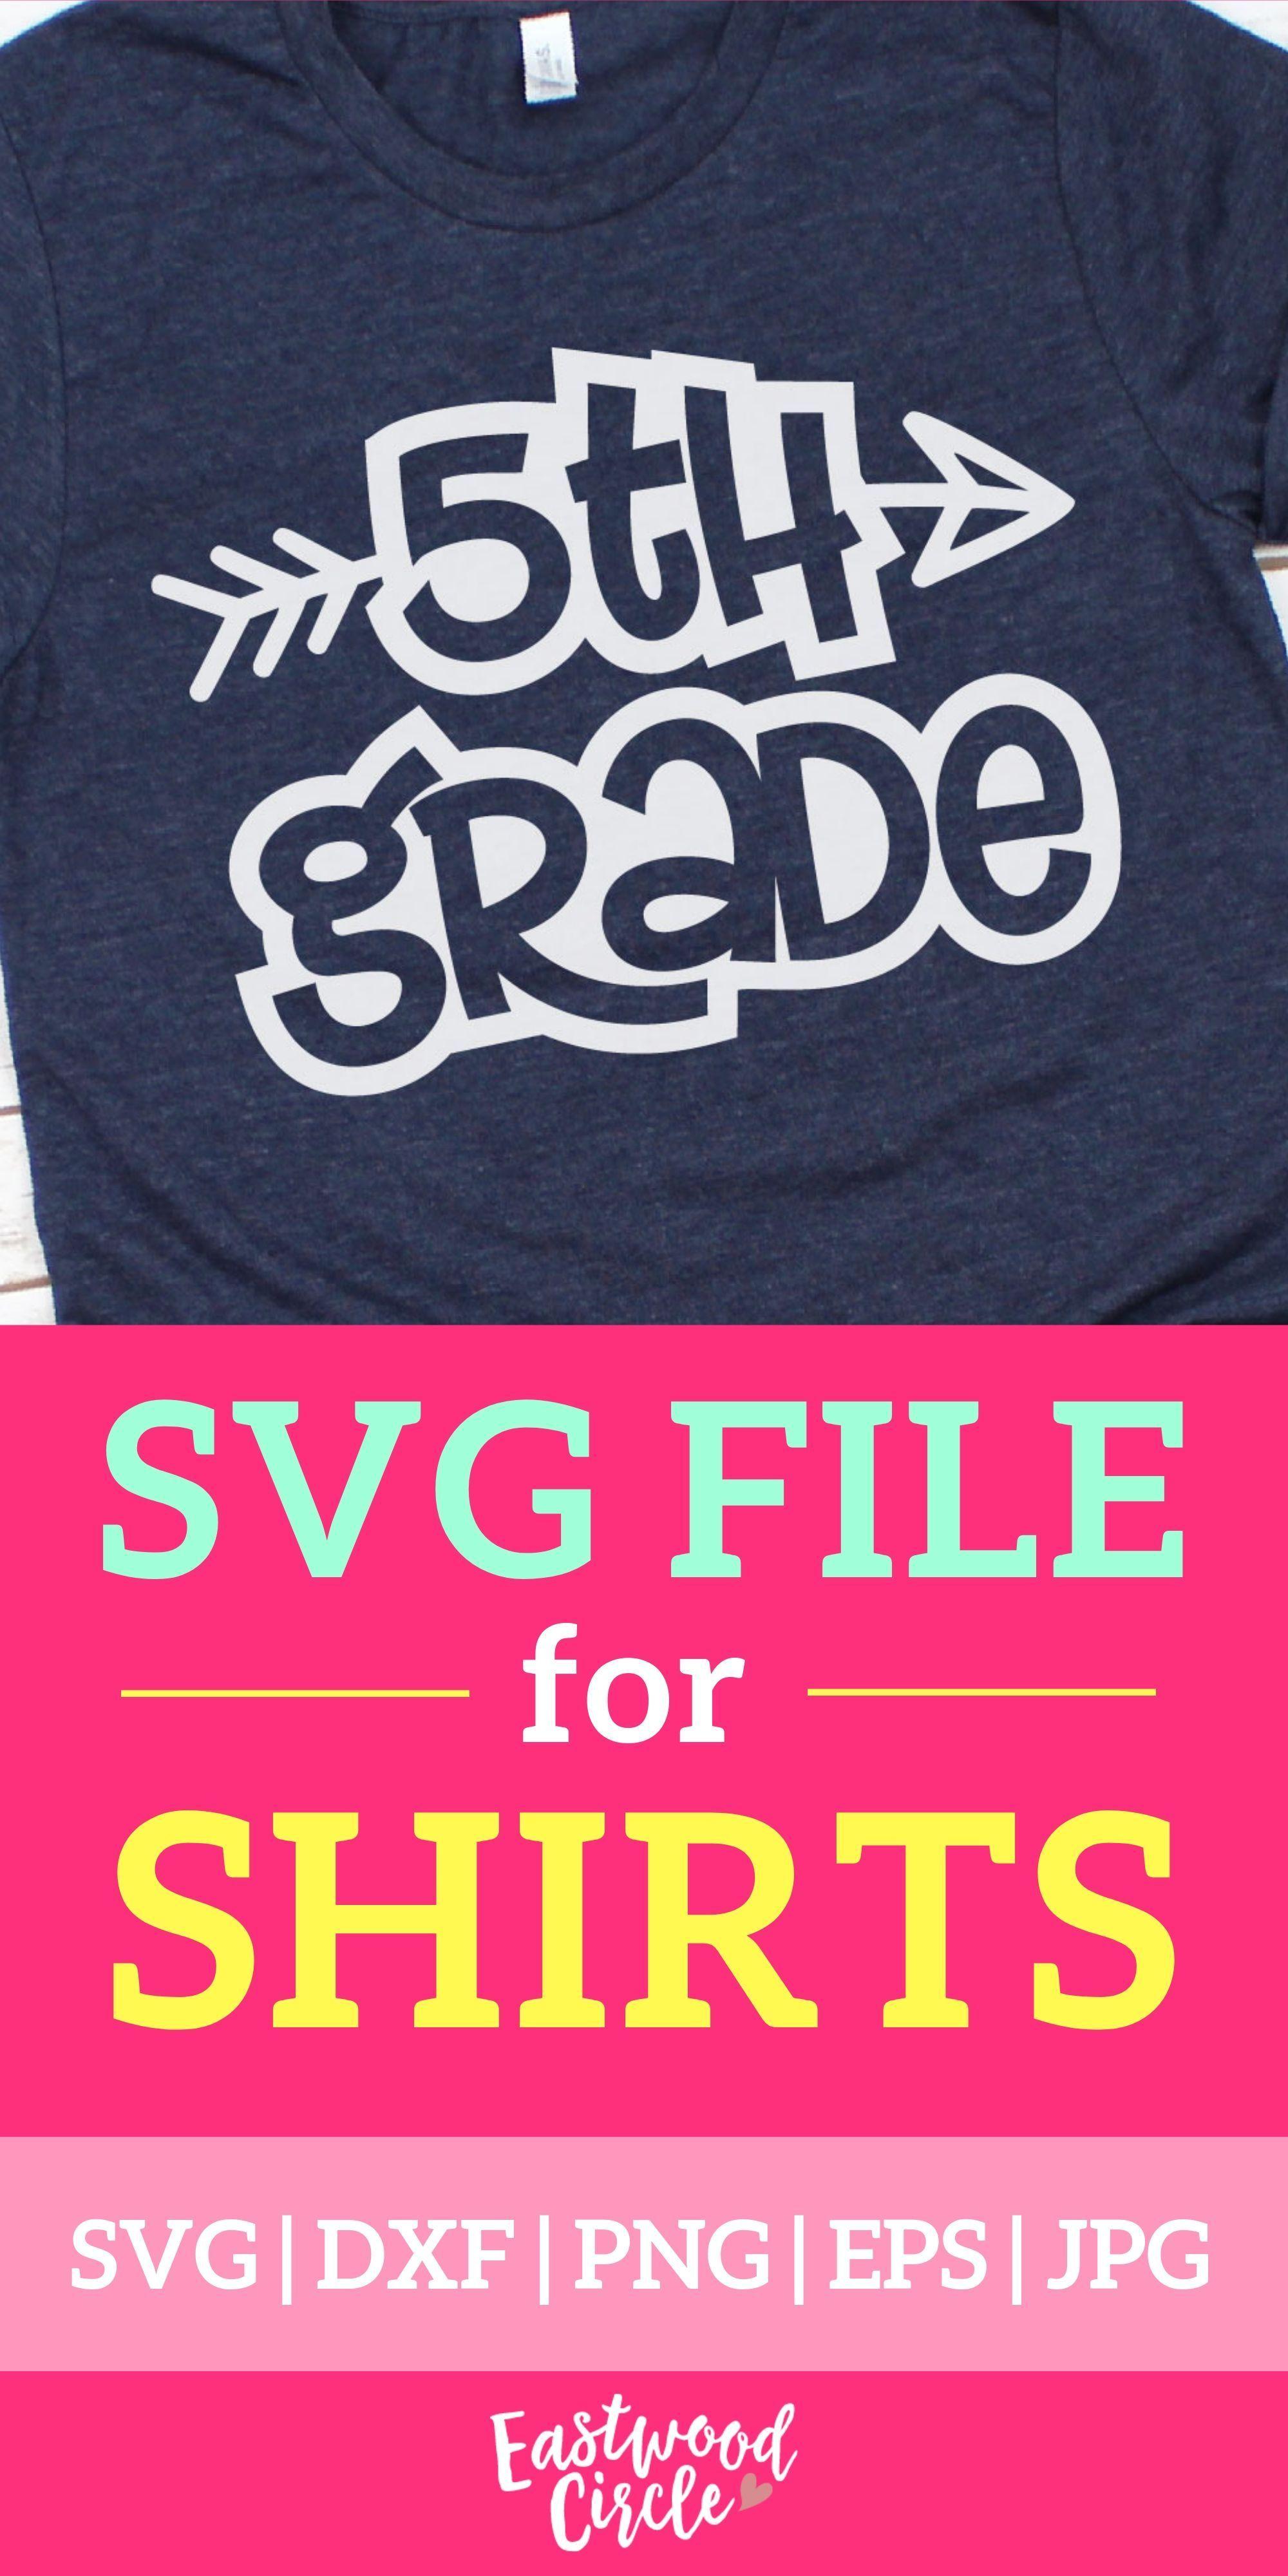 5th Grade Svg Fifth Grade Svg School Svg School Svg Files Teacher Svg 5th Grade Teacher Svg Fifth Grade Teacher 5th Grade Shirt Svg Svg School Bundles Sixth Grade